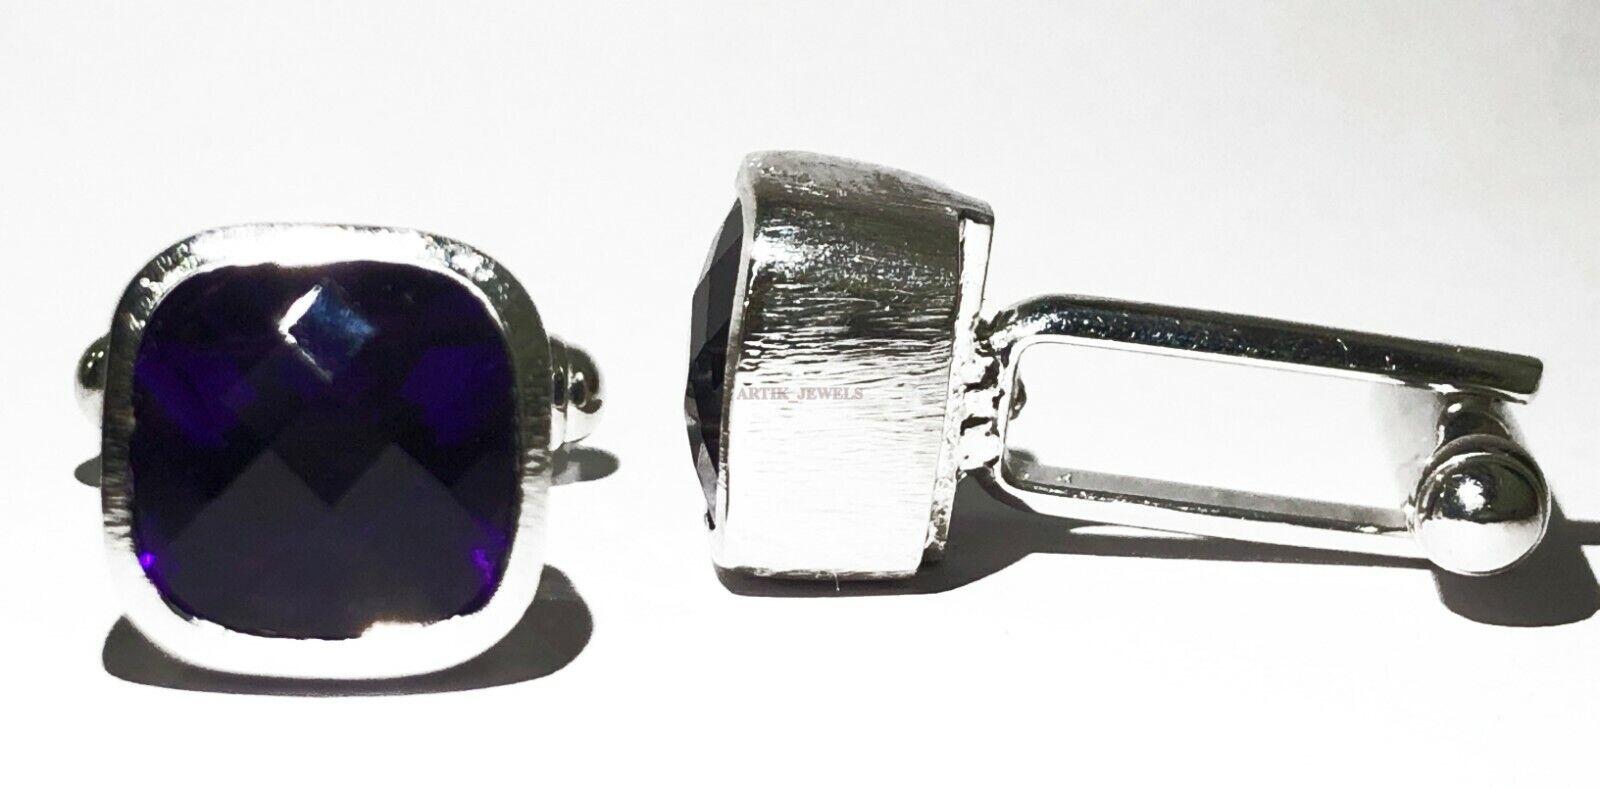 Details about  /925 Sterling Silver Natural Amethyst /& Cz Gem Stone Cuflink /& Button Tuxedo